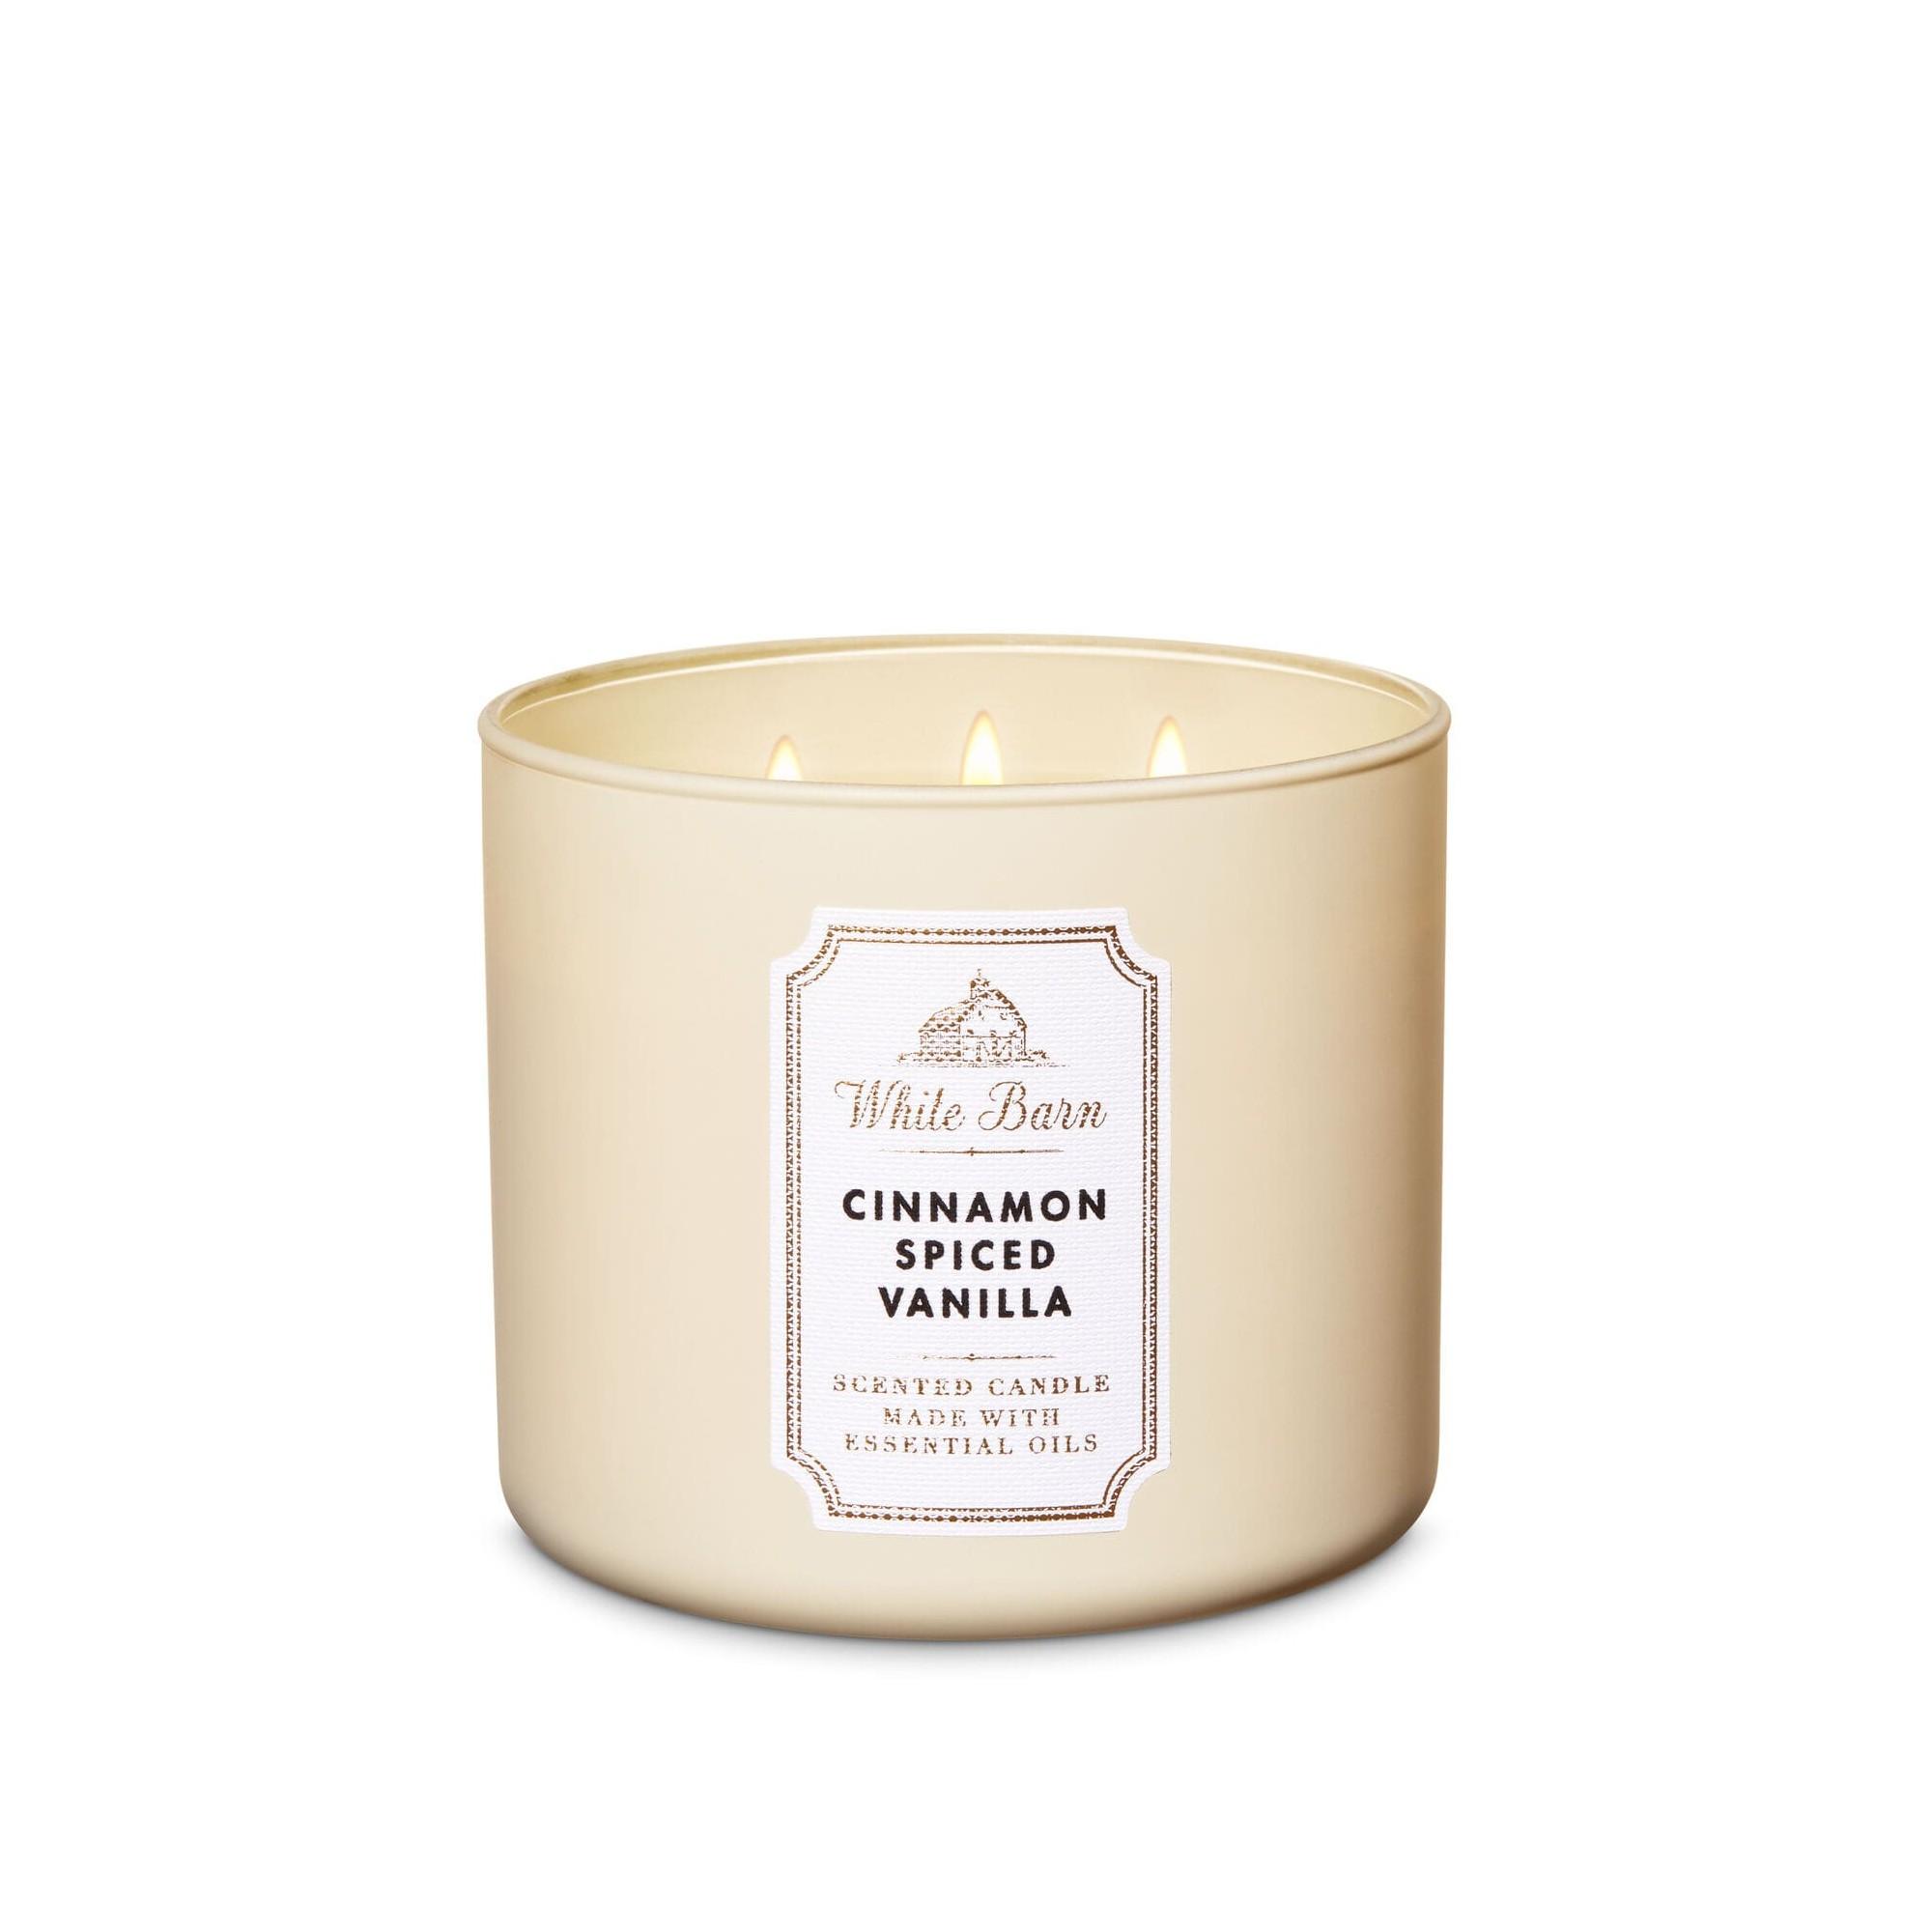 Bath & Body Works White Barn Cinnamon Spiced Vanilla 3 Wick Scented Candle